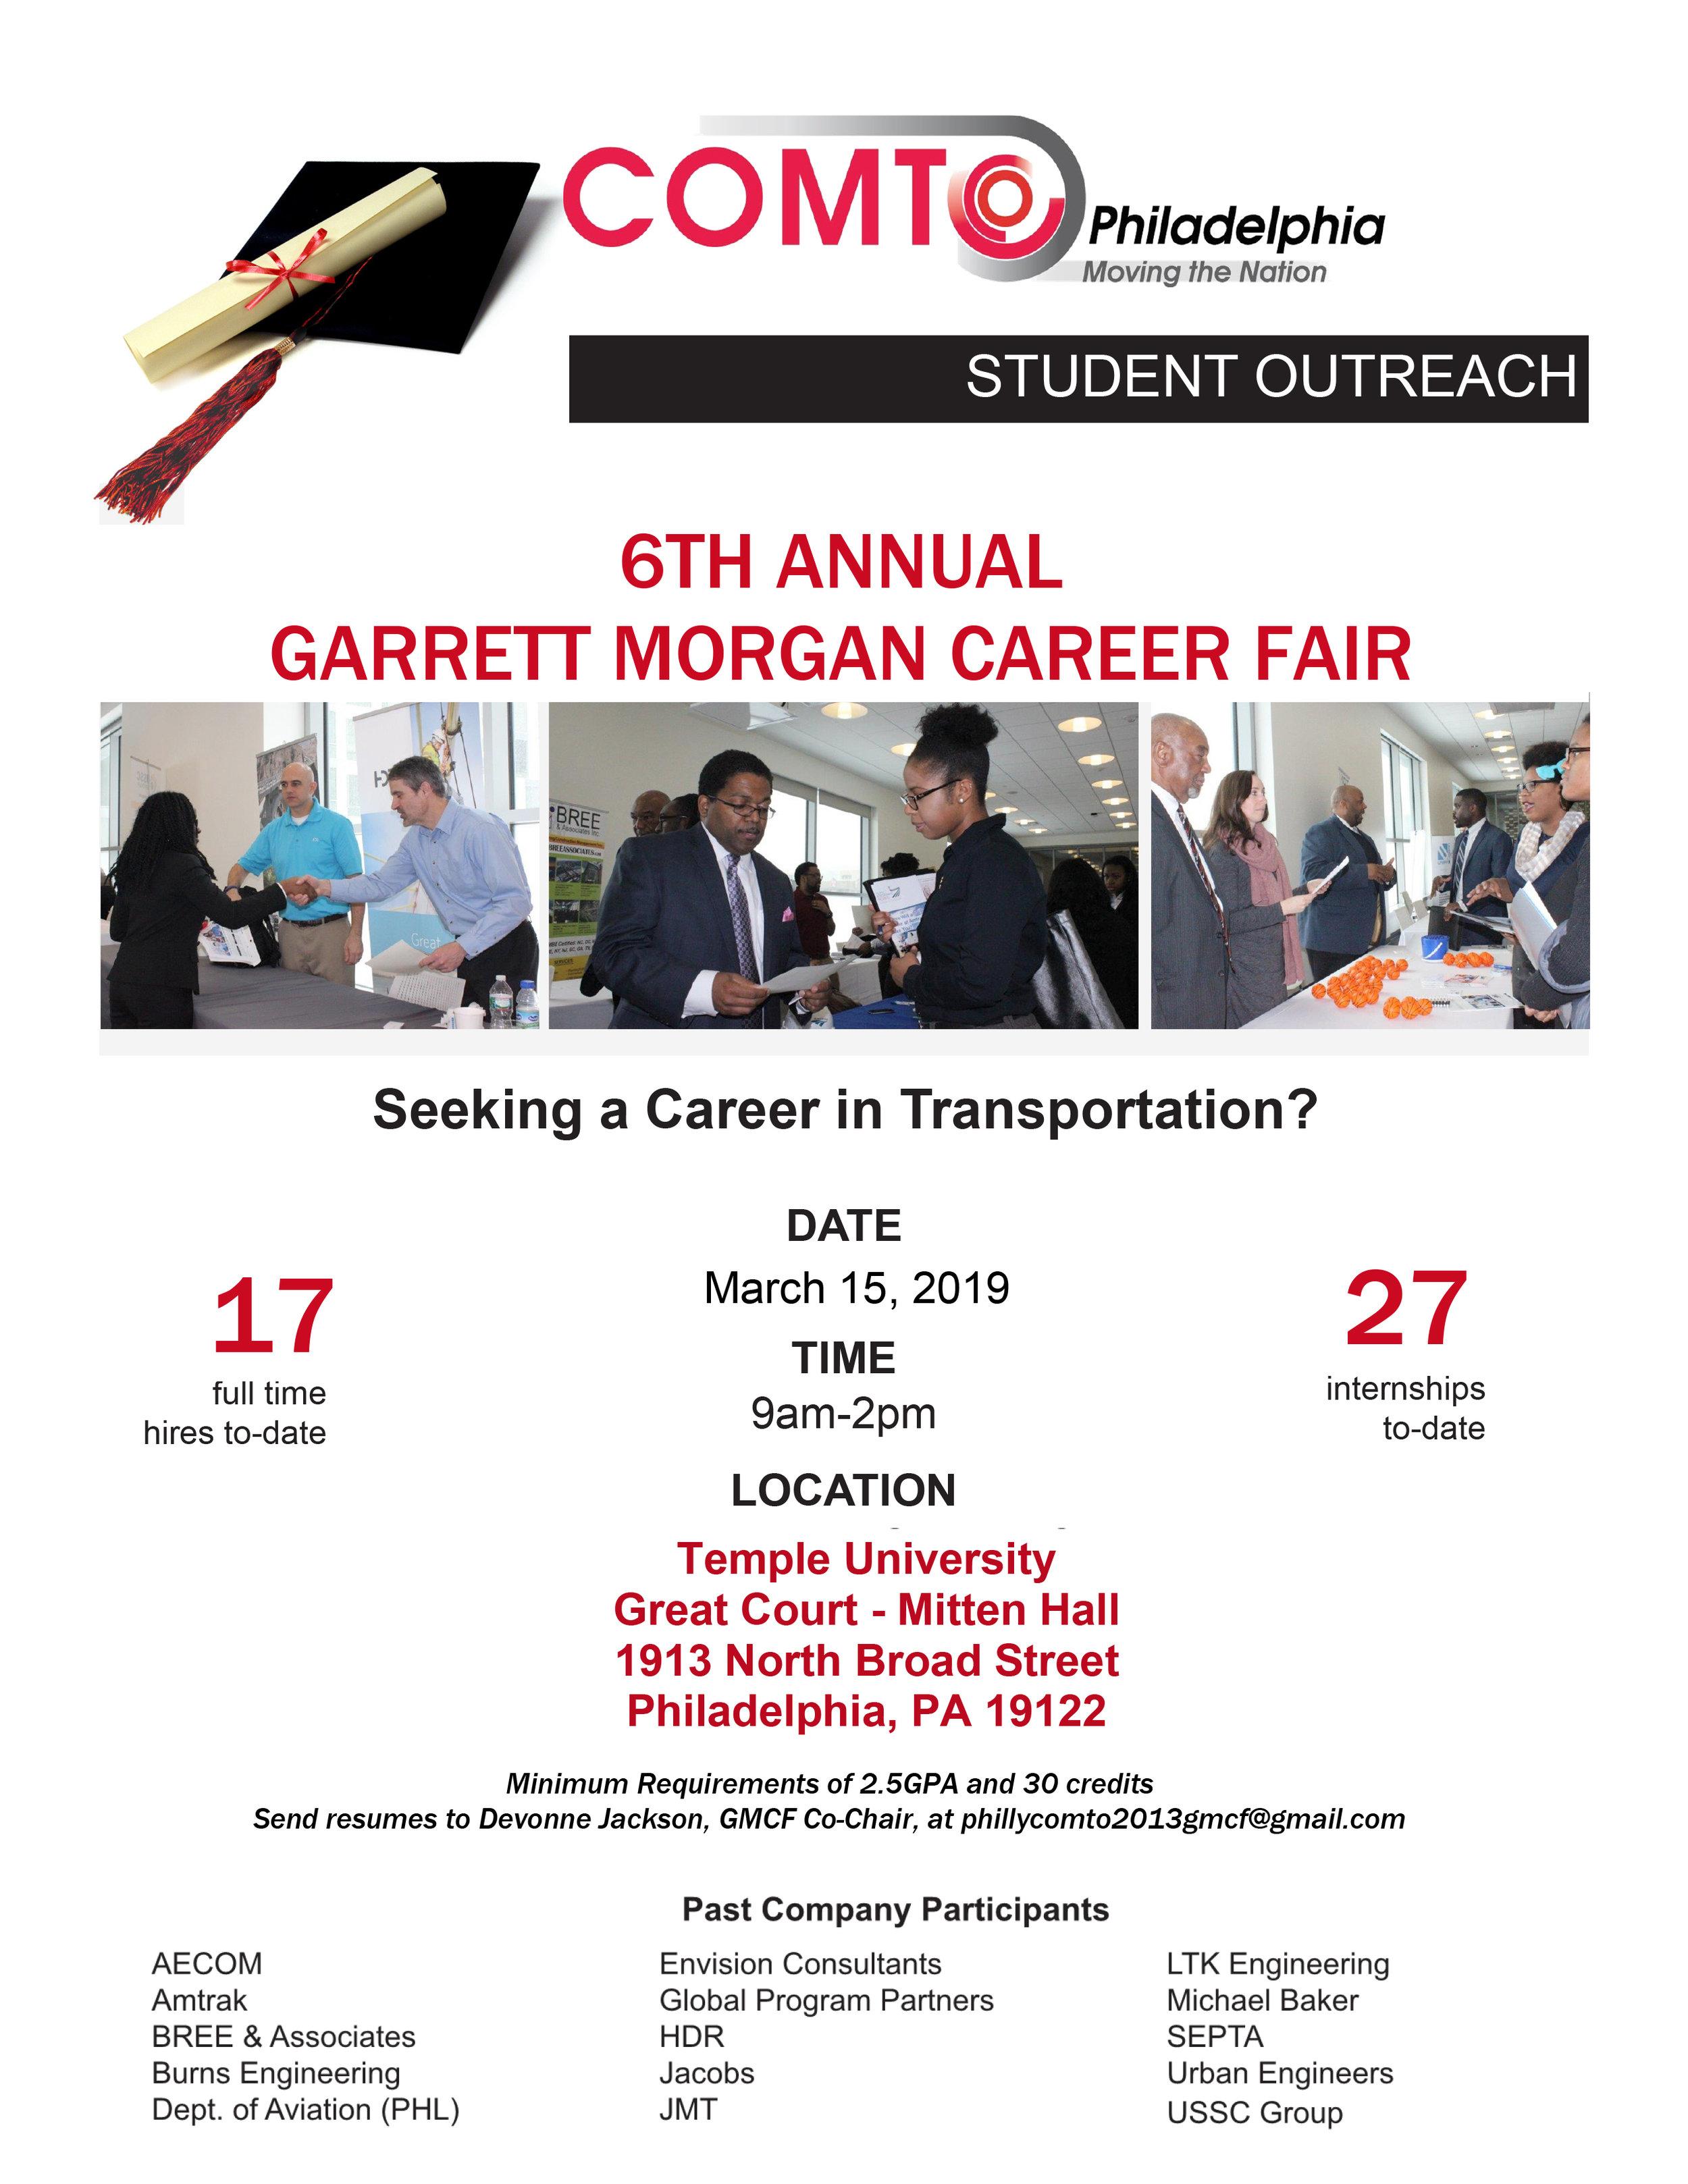 Garret Morgan Career Fair — COMTO Philadelphia Chapter